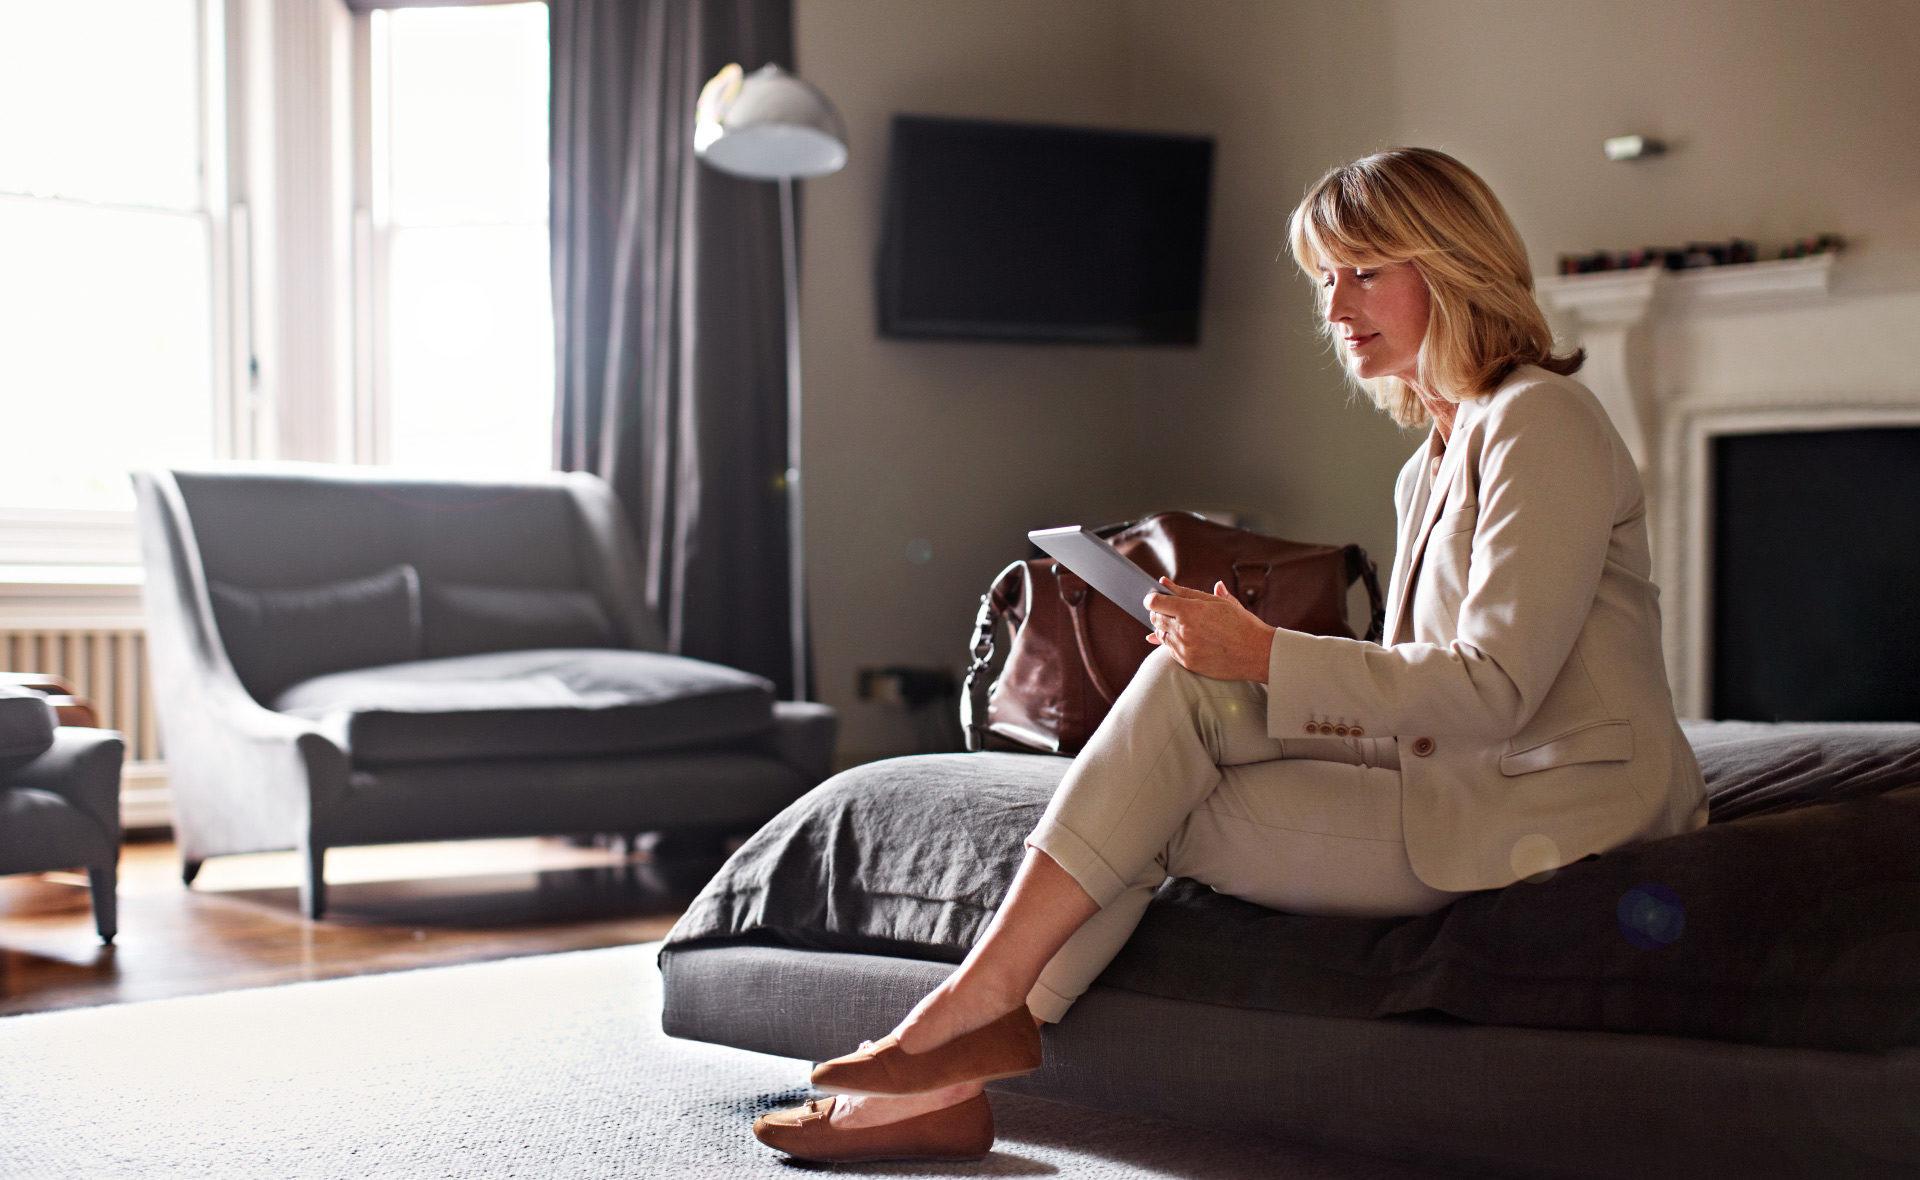 booking-alojamiento-reservar-apartamentos-hoteles-clientes-